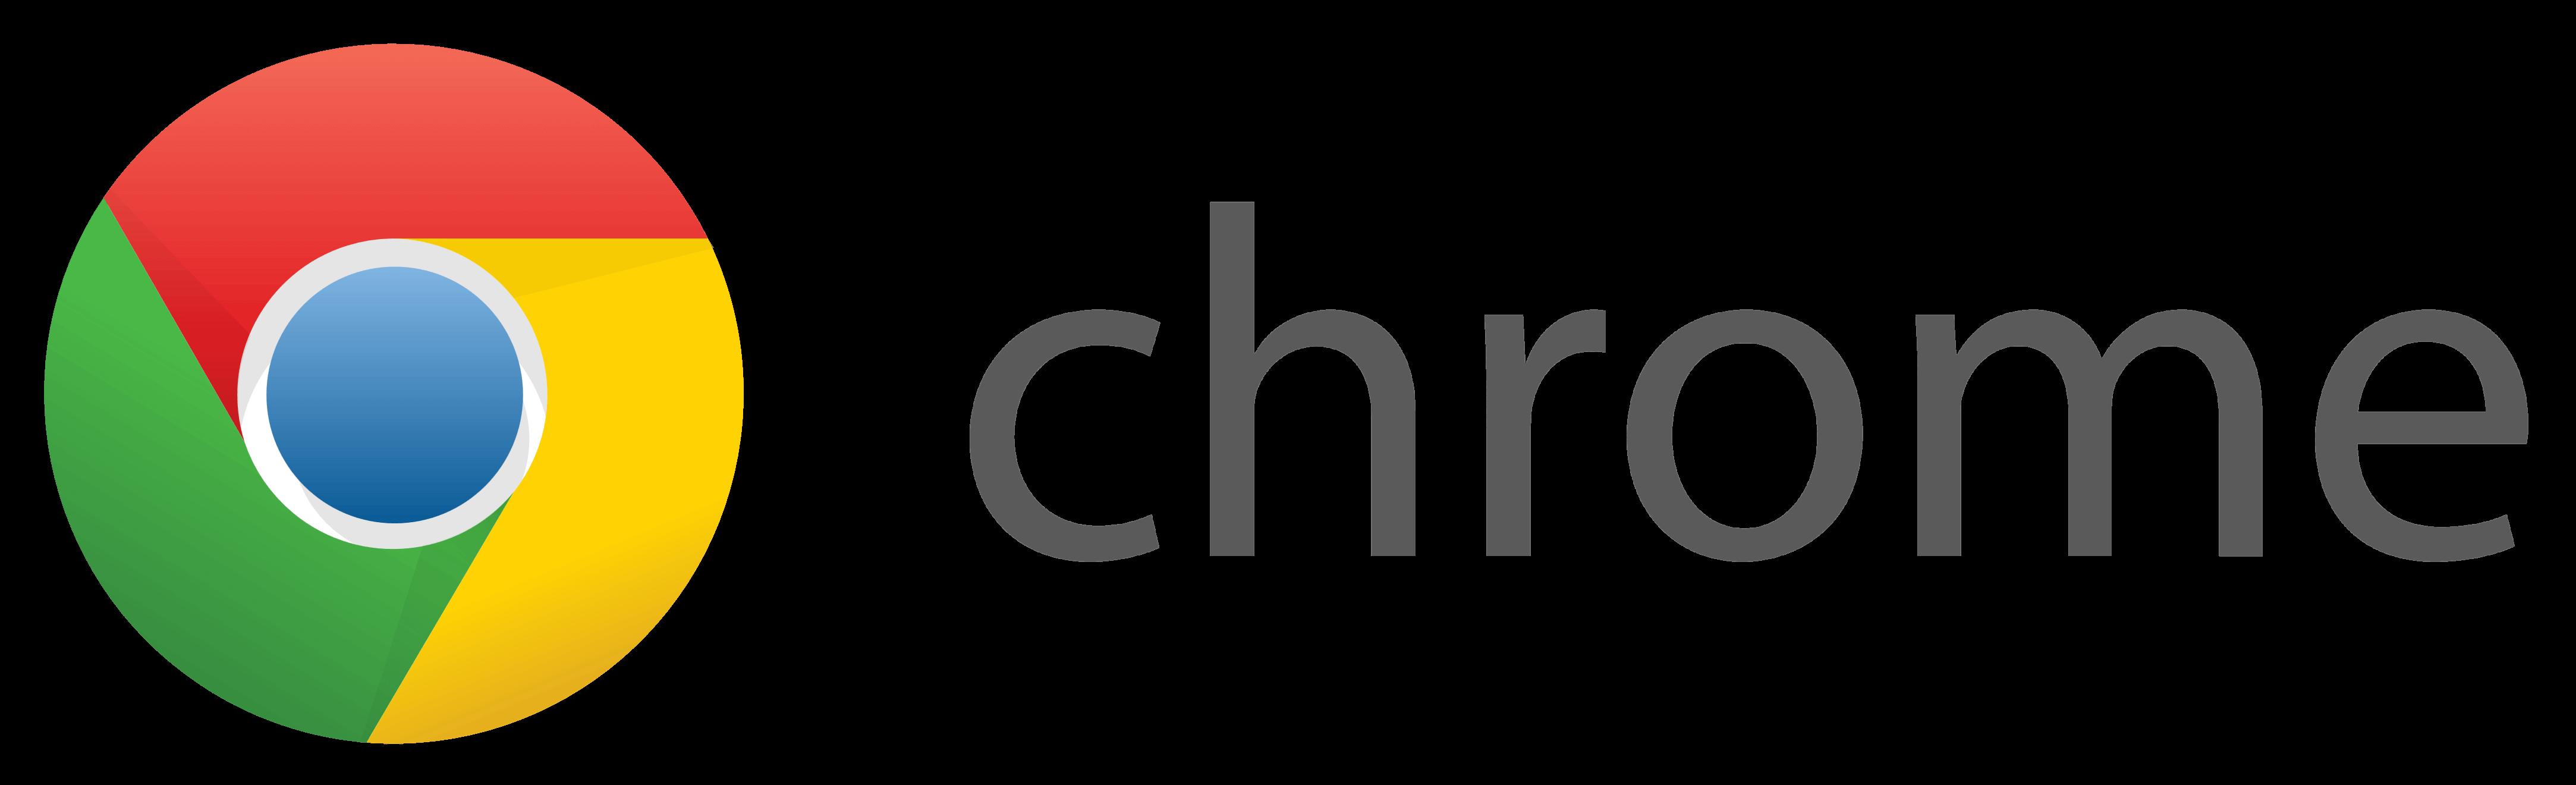 Google Chrome logo, icon - Google Chrome Logo PNG